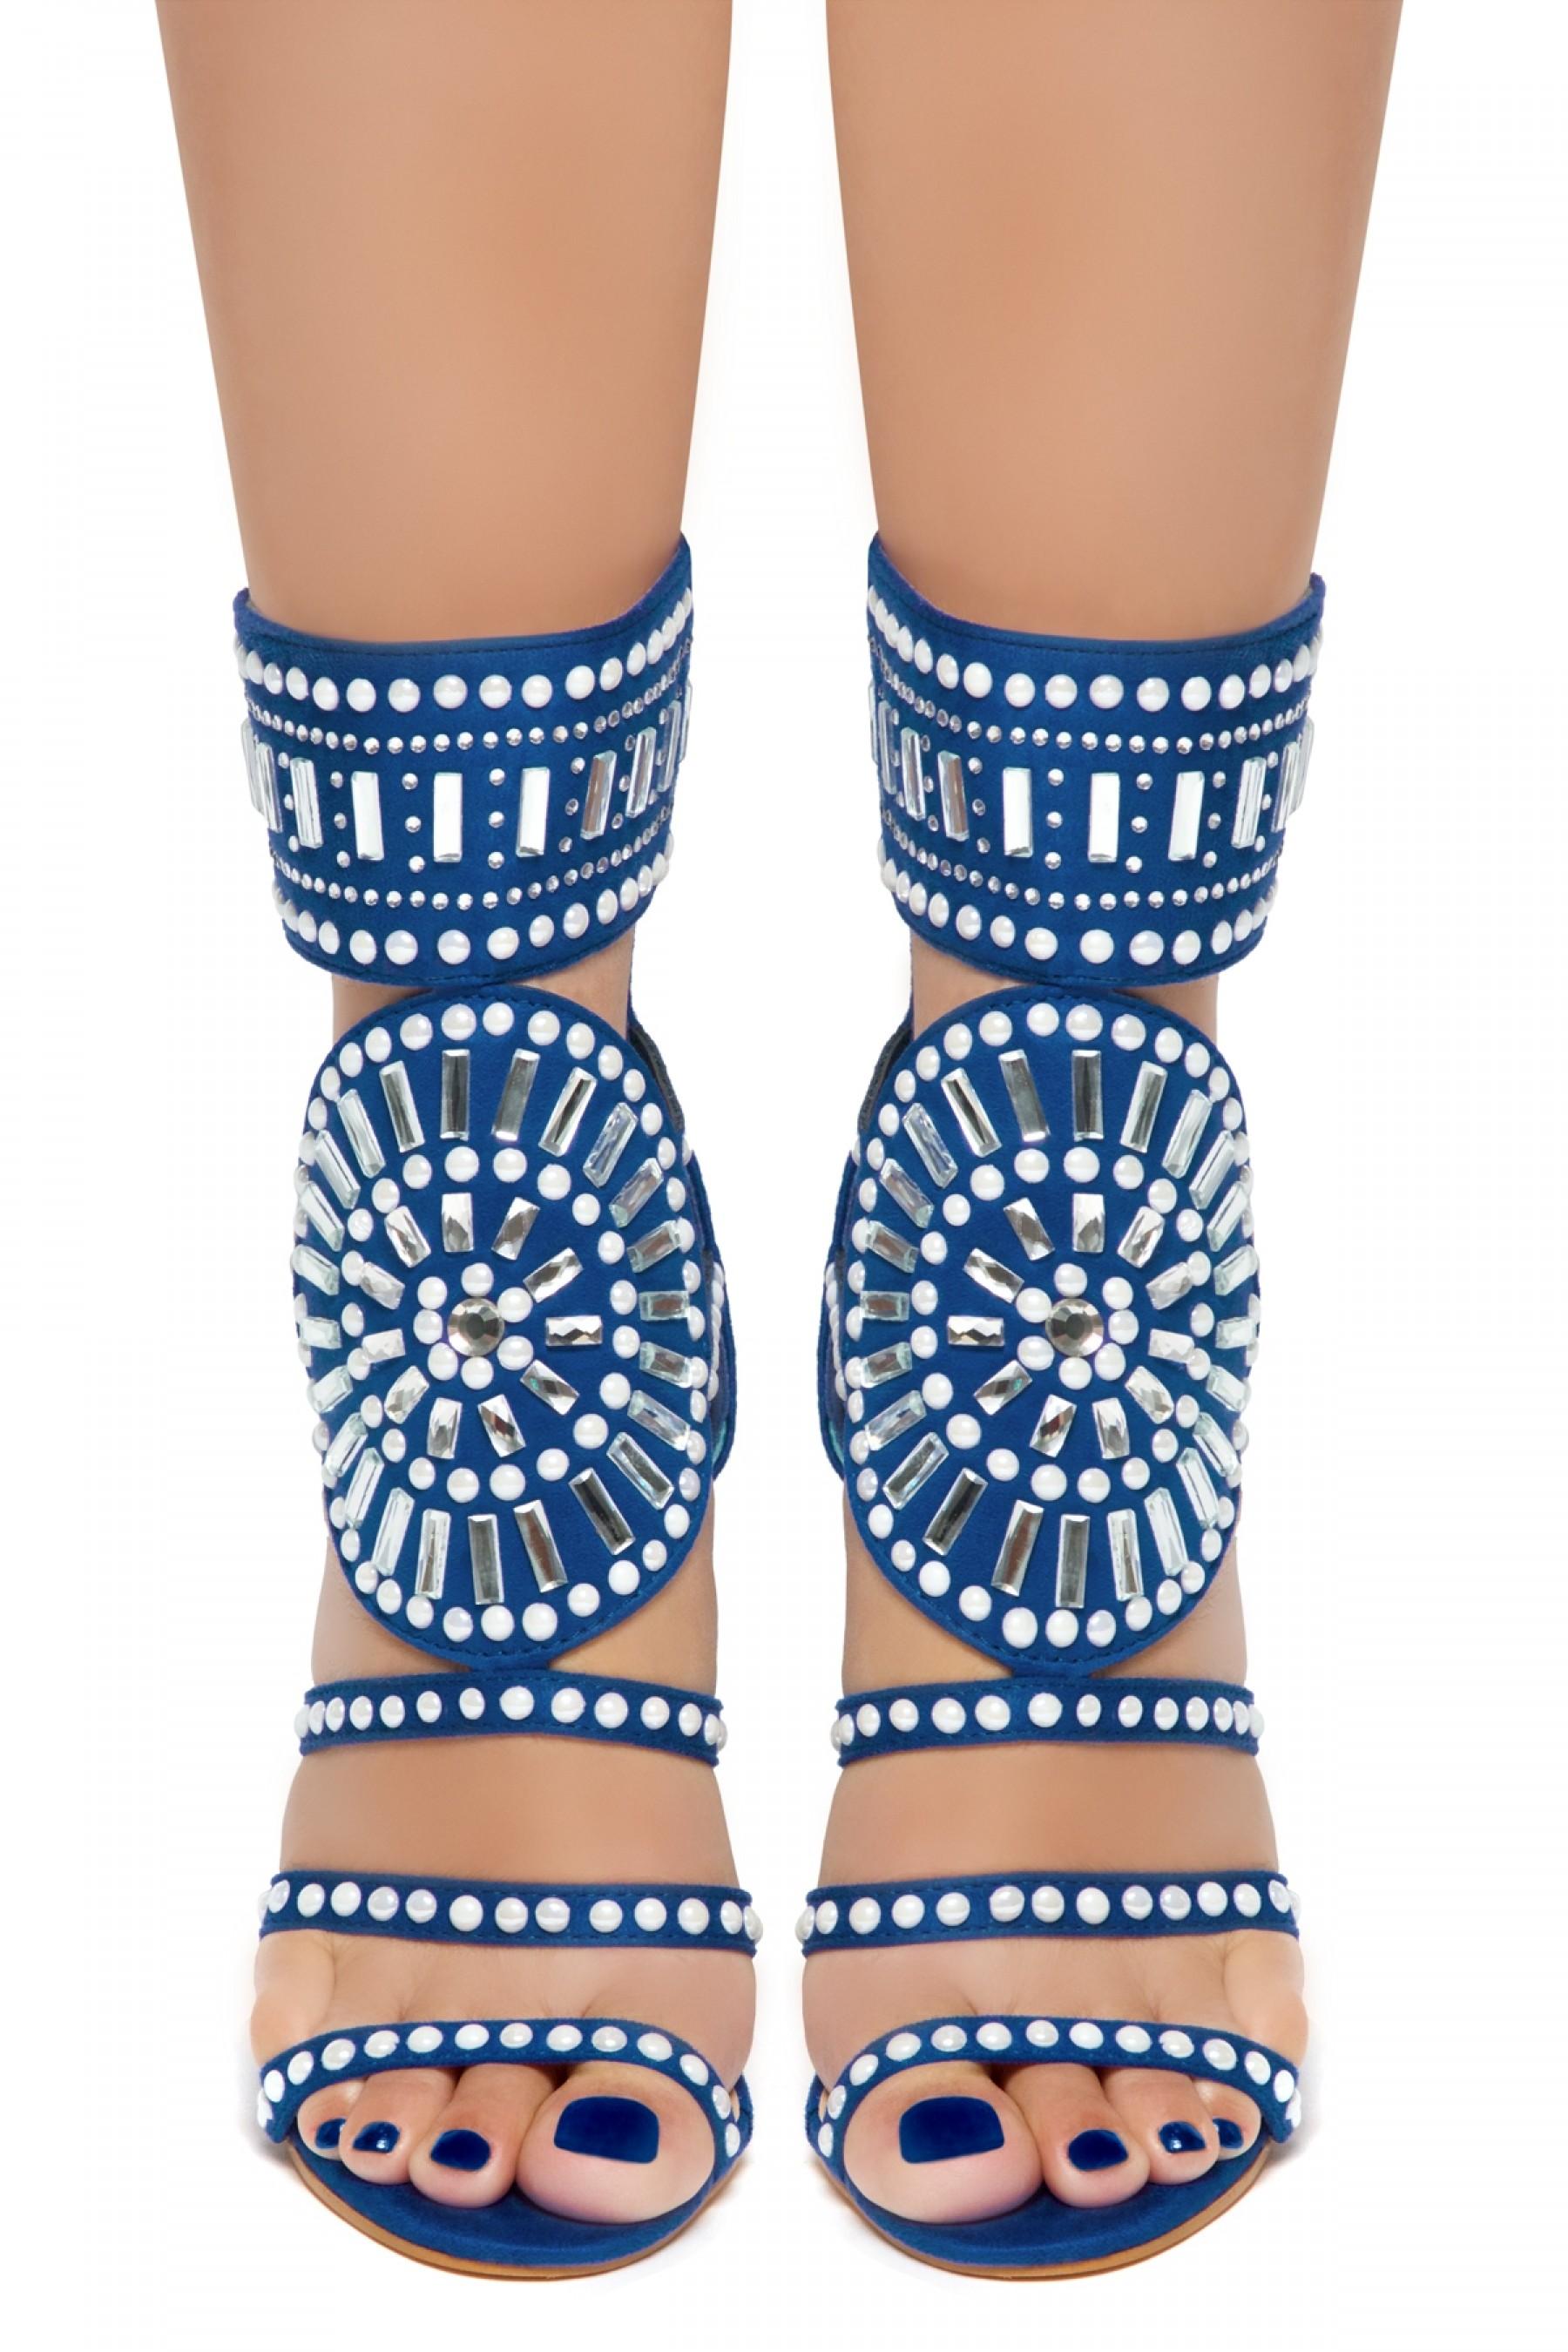 HerStyle Fashion Crowd stiletto heel, jeweled embellishments (RoyalBlue)